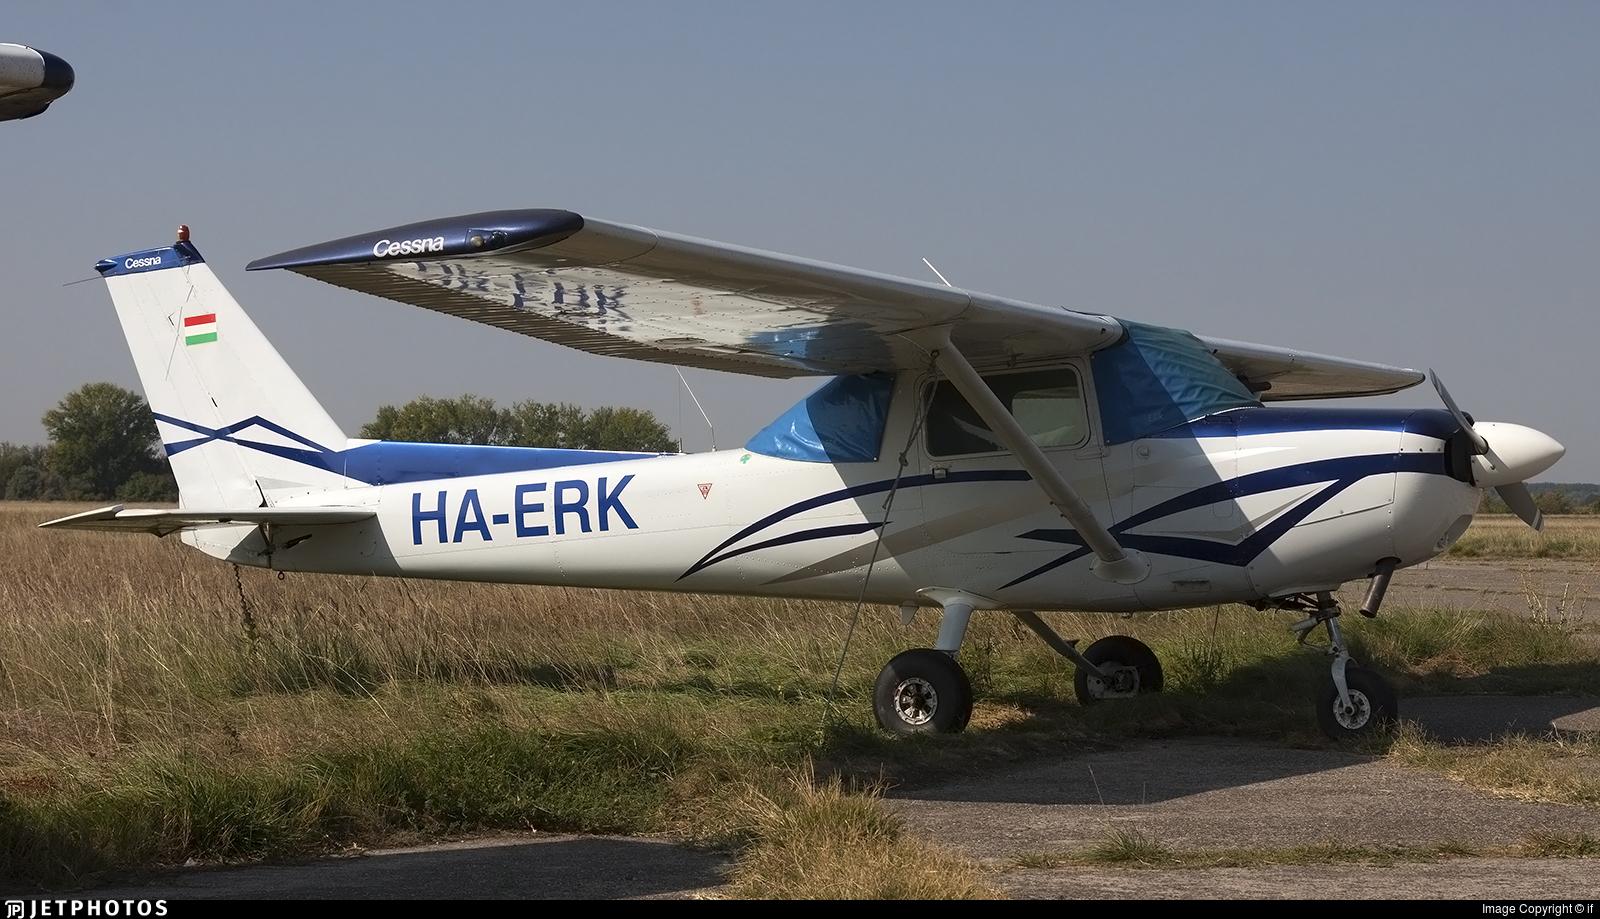 HA-ERK - Cessna 152 - Private